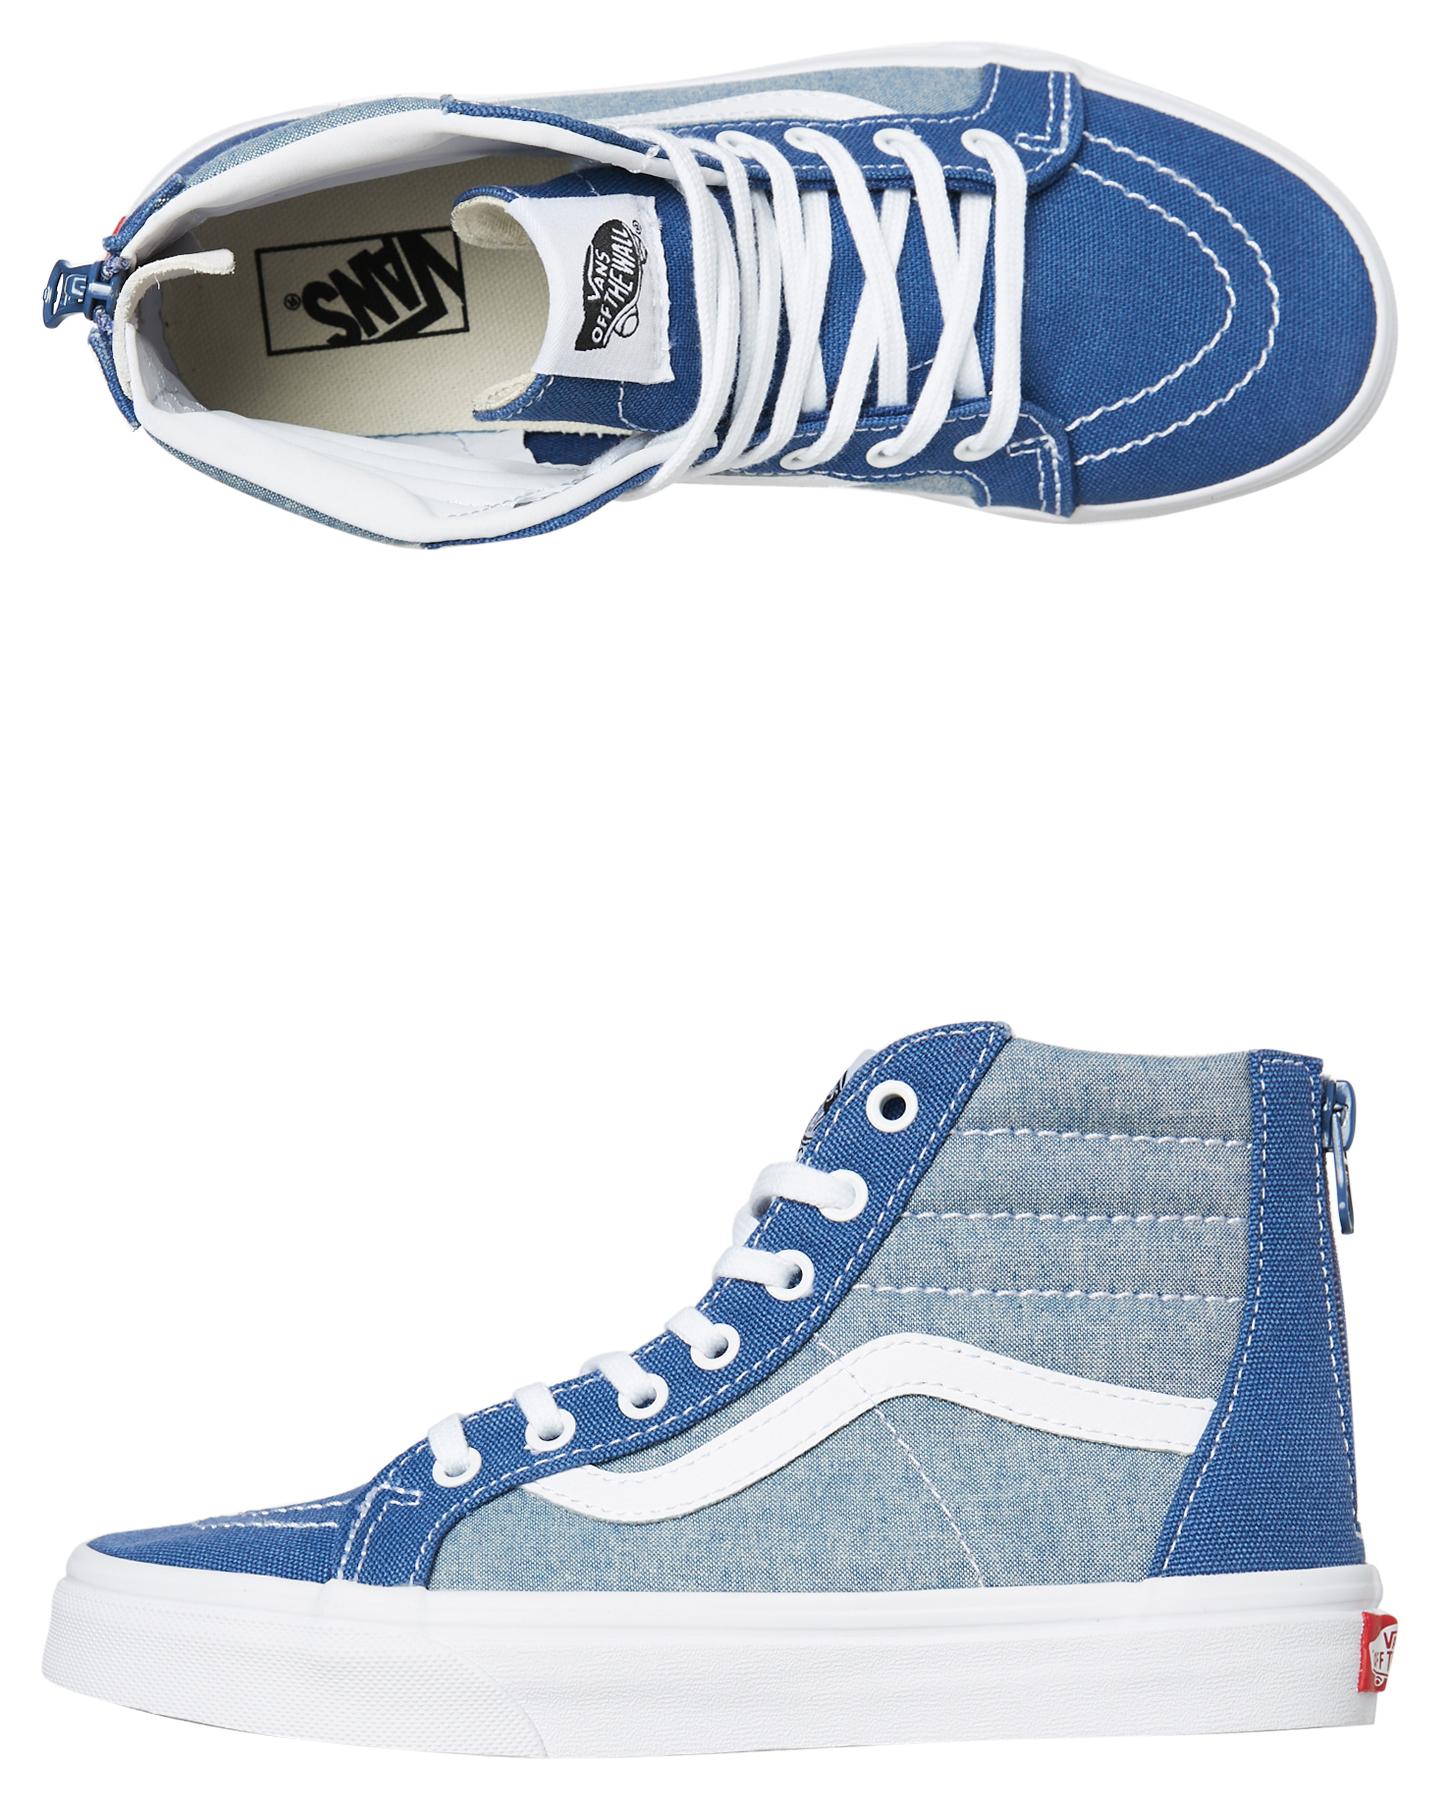 5af5003727 Details about Vans Boys Sk8 Hi Shoe - Teens Lace Canvas Blue